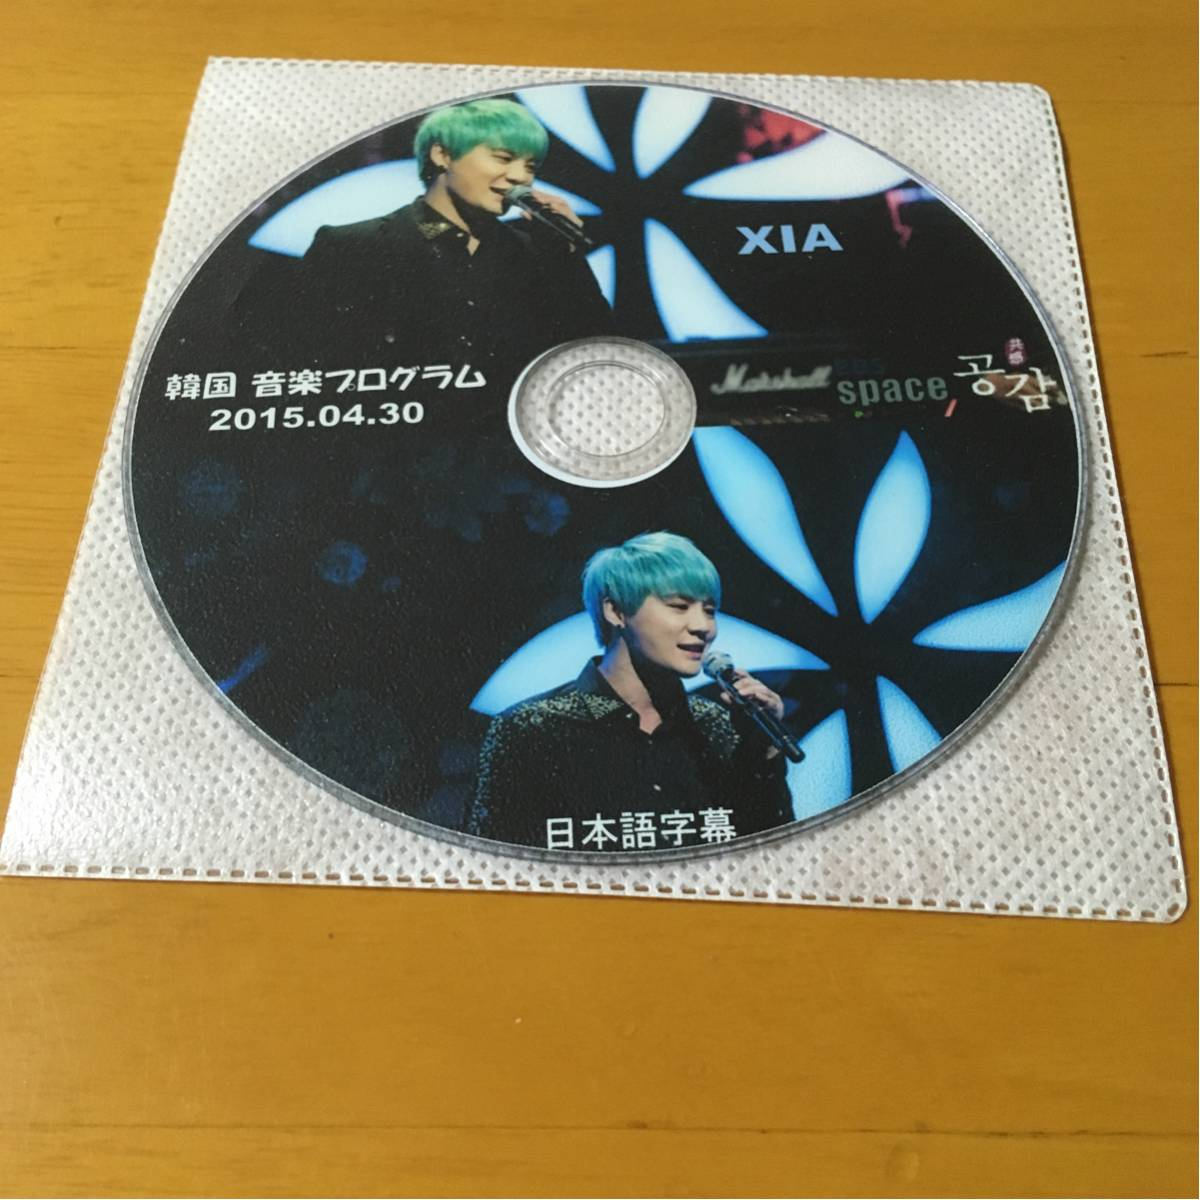 XIAジュンス★スペース共感DVD★キム・ジュンスJYJ